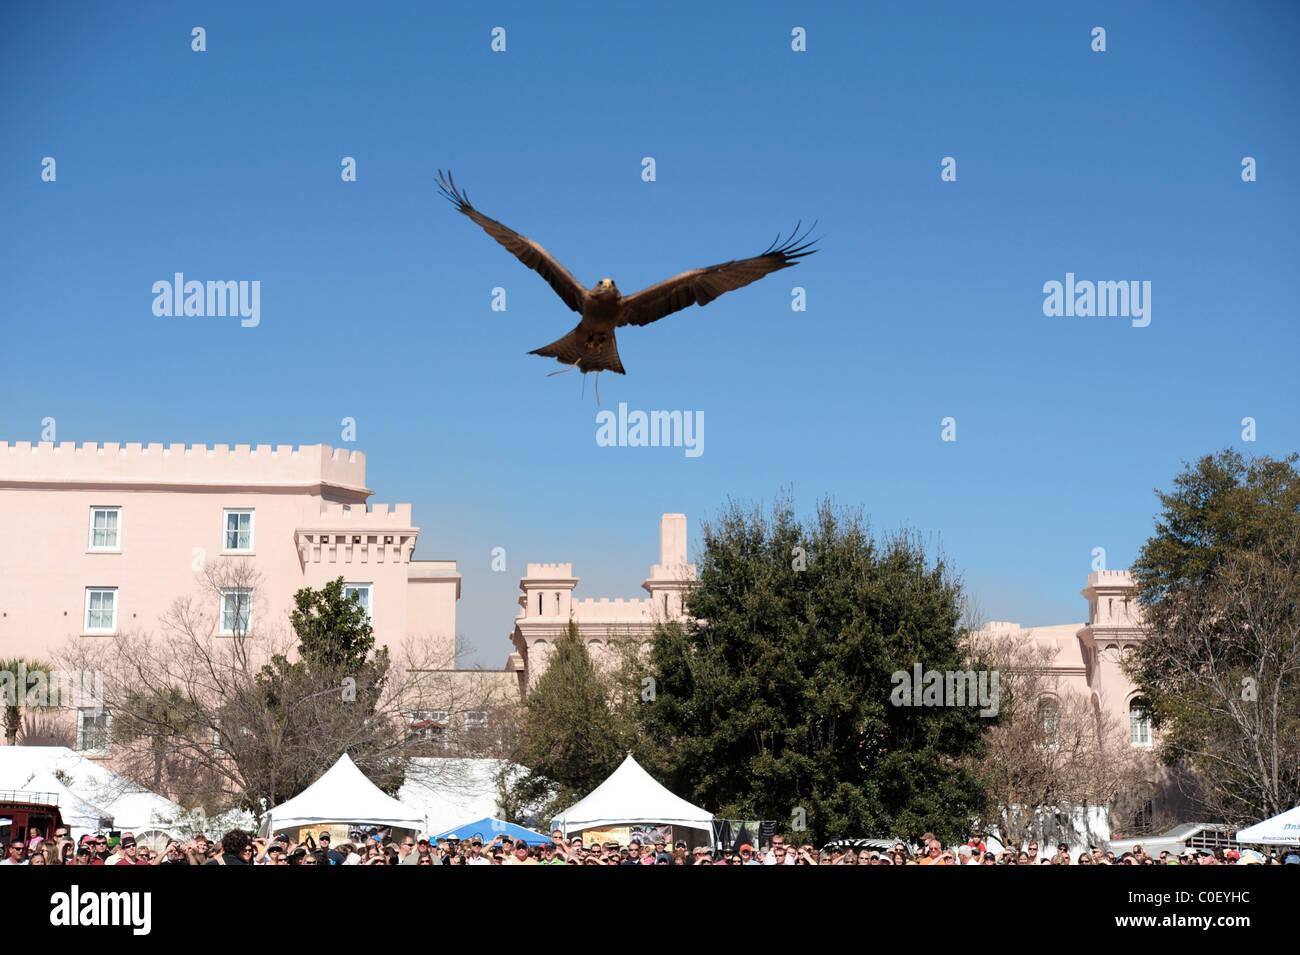 Tawny Adler im Flug über Zuschauer bei Greifvögeln demonstration Stockbild